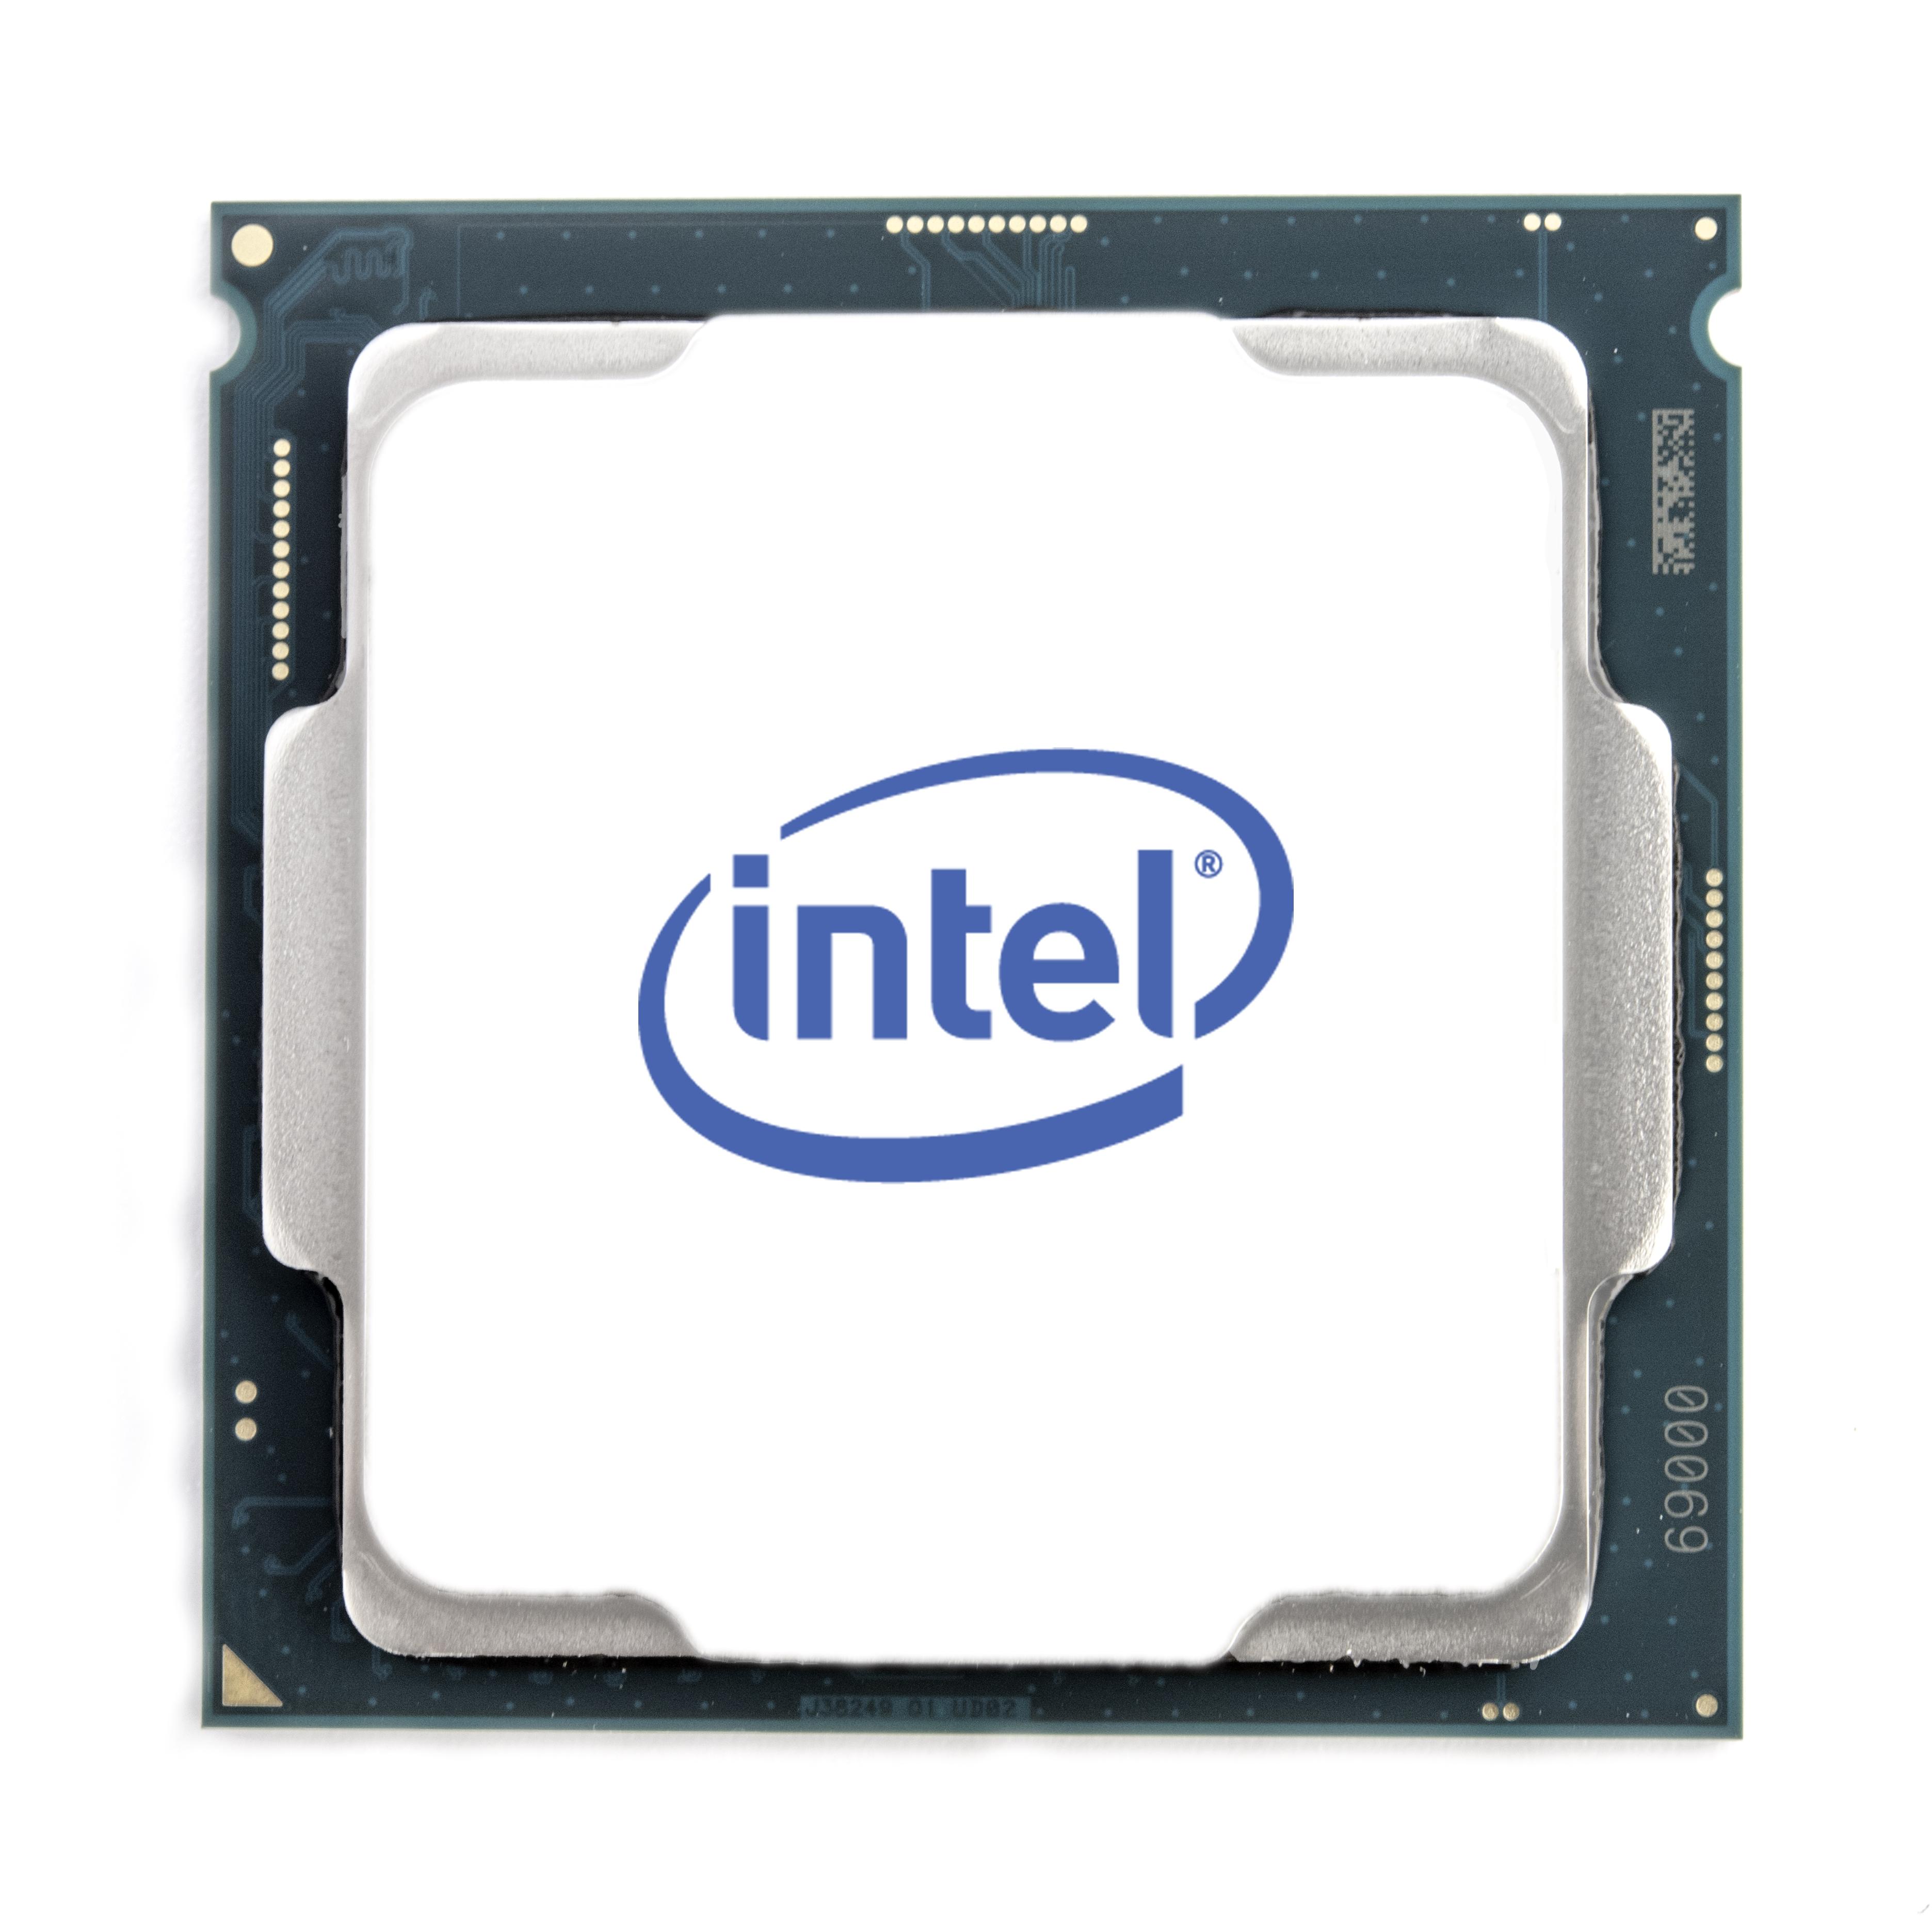 Intel Core i7 11700 - Processor 2.5 GHz (4.9 GHz) - 8-cores - 16 threads -16 MB cache -LGA1200